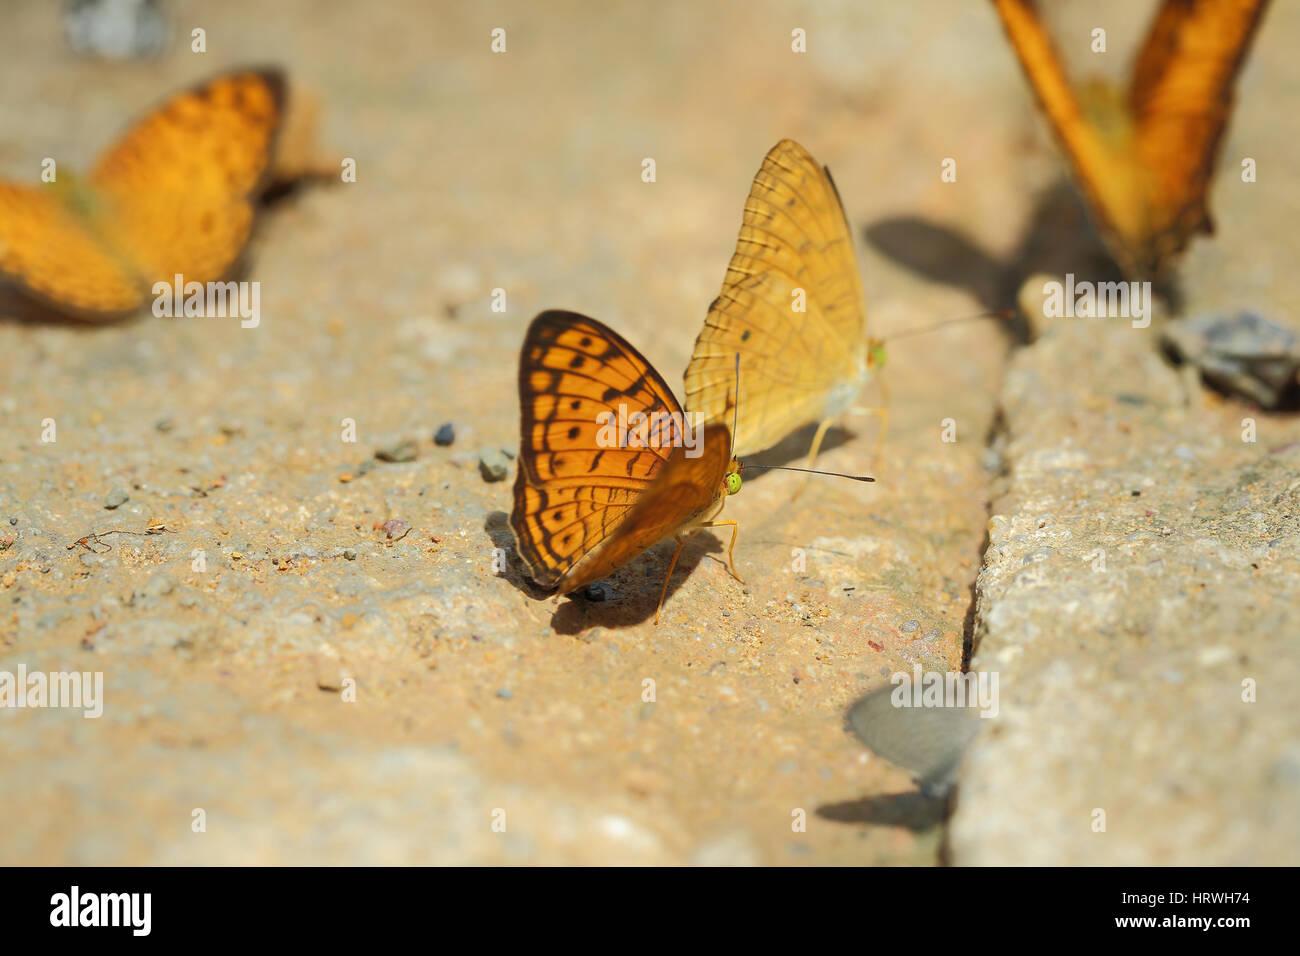 El enfoque selectivo de batterfly amarillo sobre fondo de naturaleza abstracta borrosa. Foto de stock